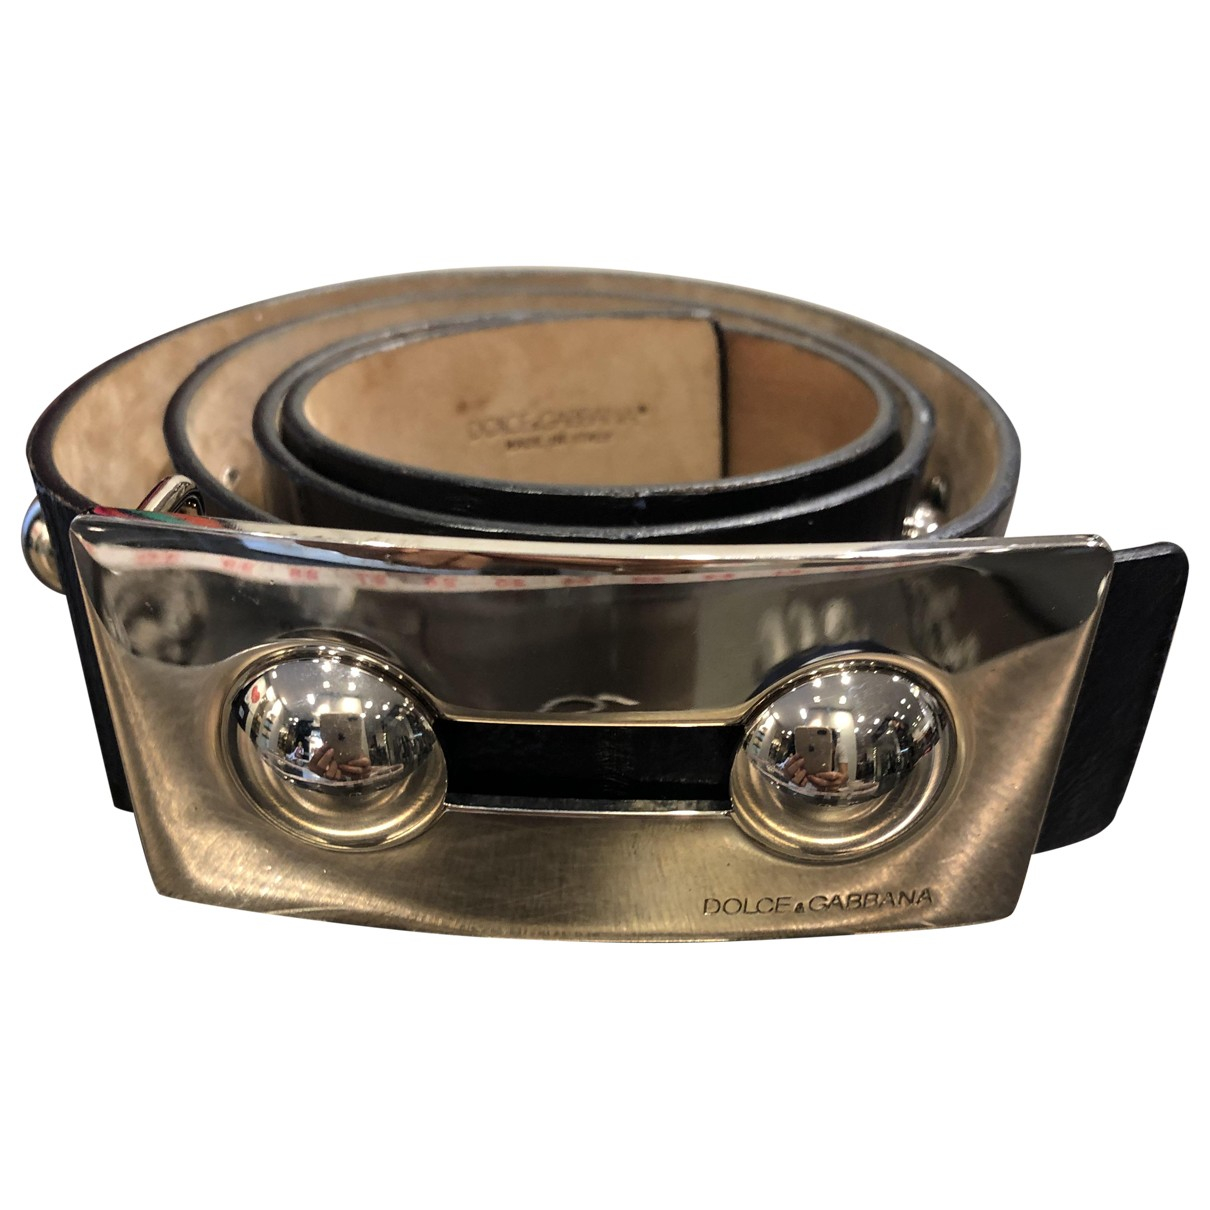 Dolce & Gabbana \N Leather belt for Women 90 cm